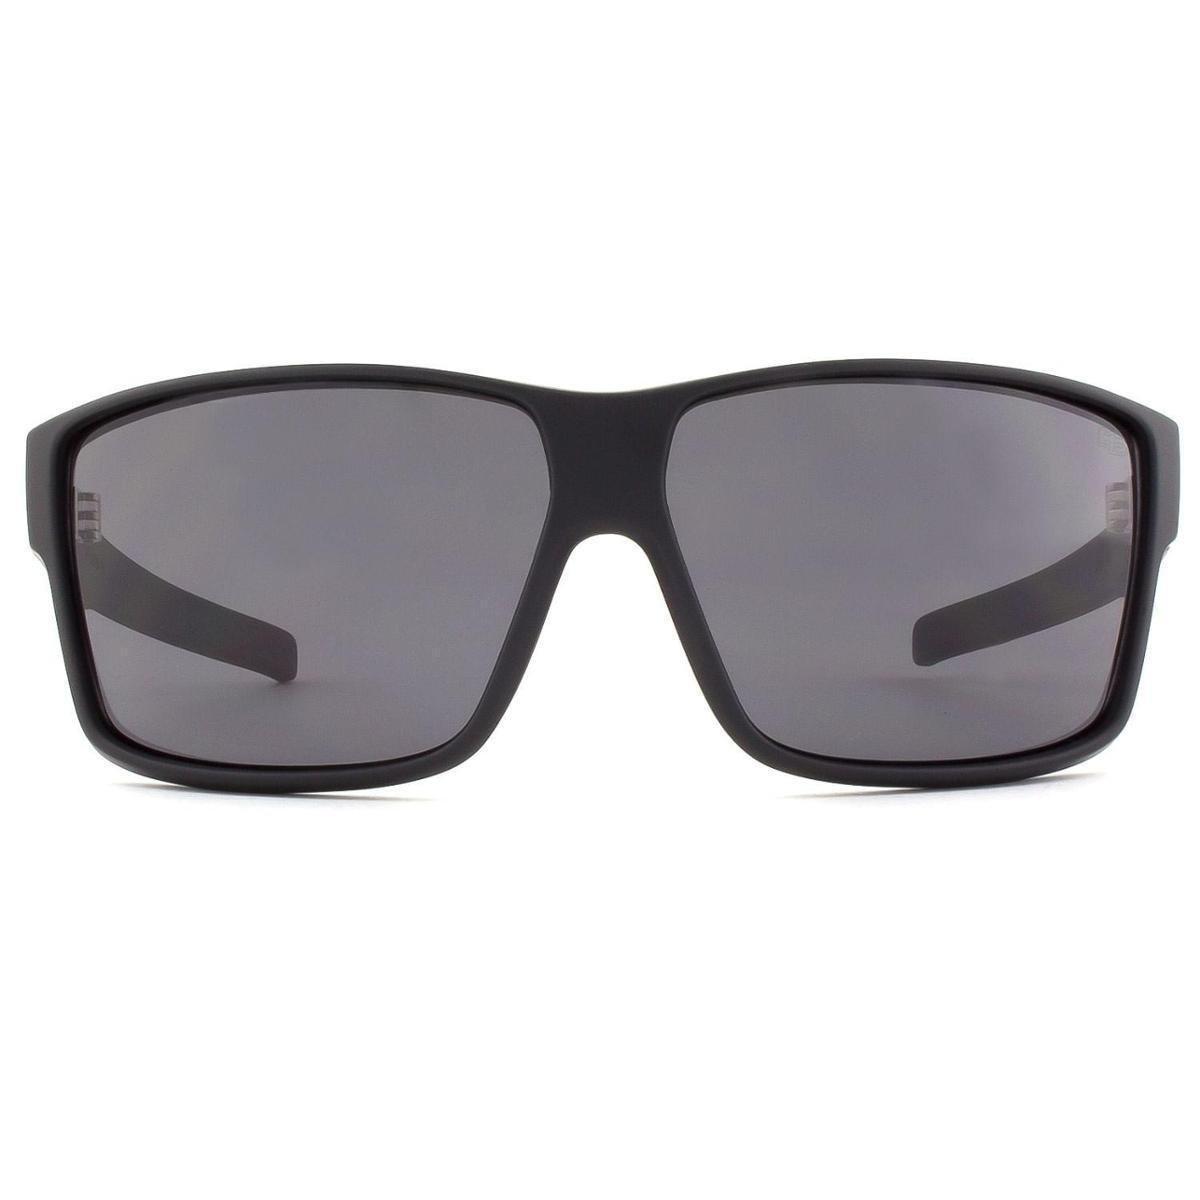 Óculos HB Big Vert 90109 00100 - Compre Agora   Netshoes 7c790b30cb